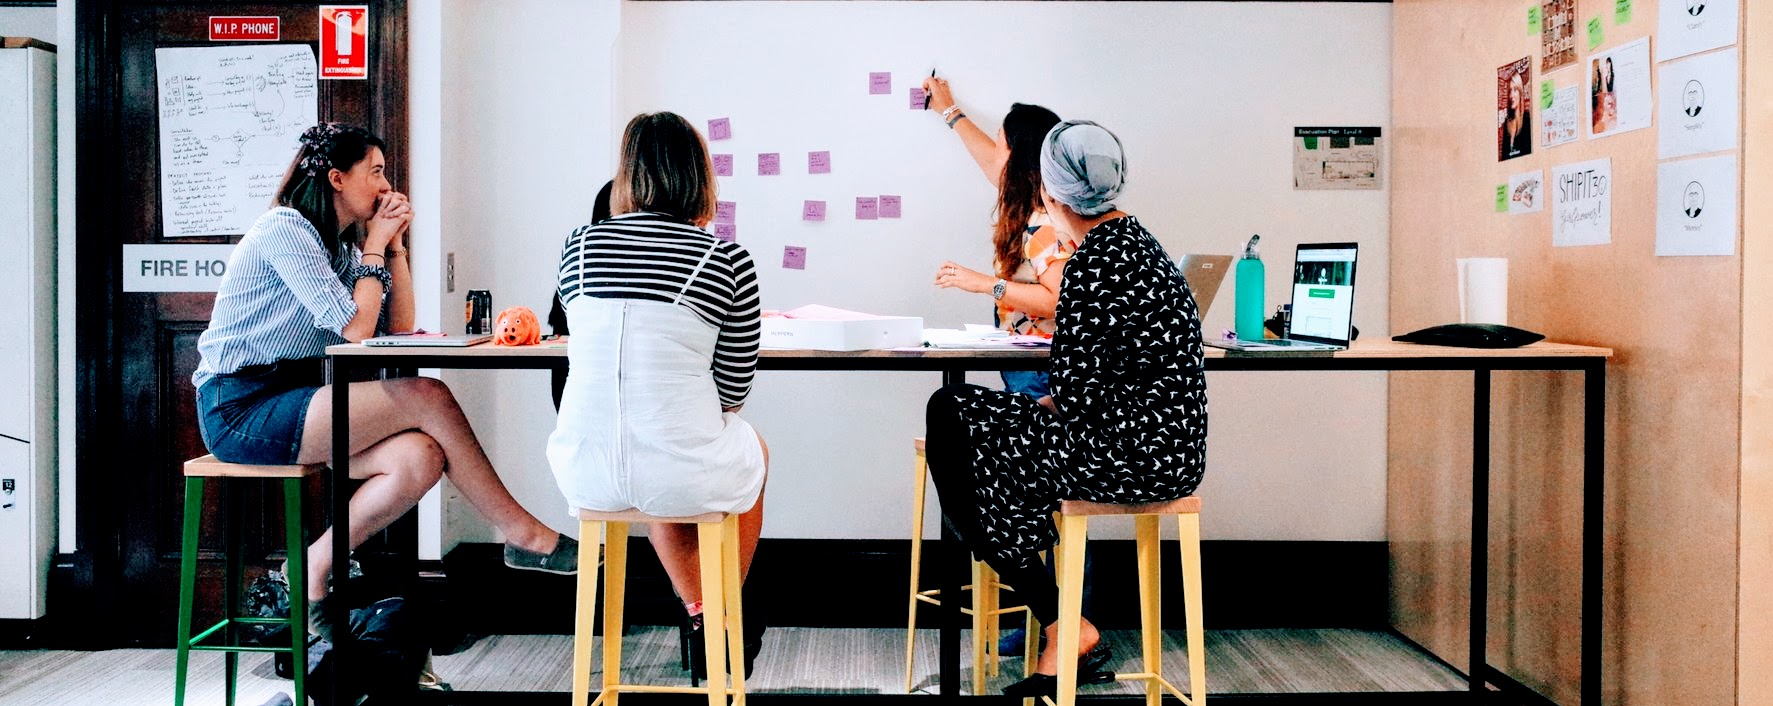 Facilitating winning Shipit project kick off at Atlassian